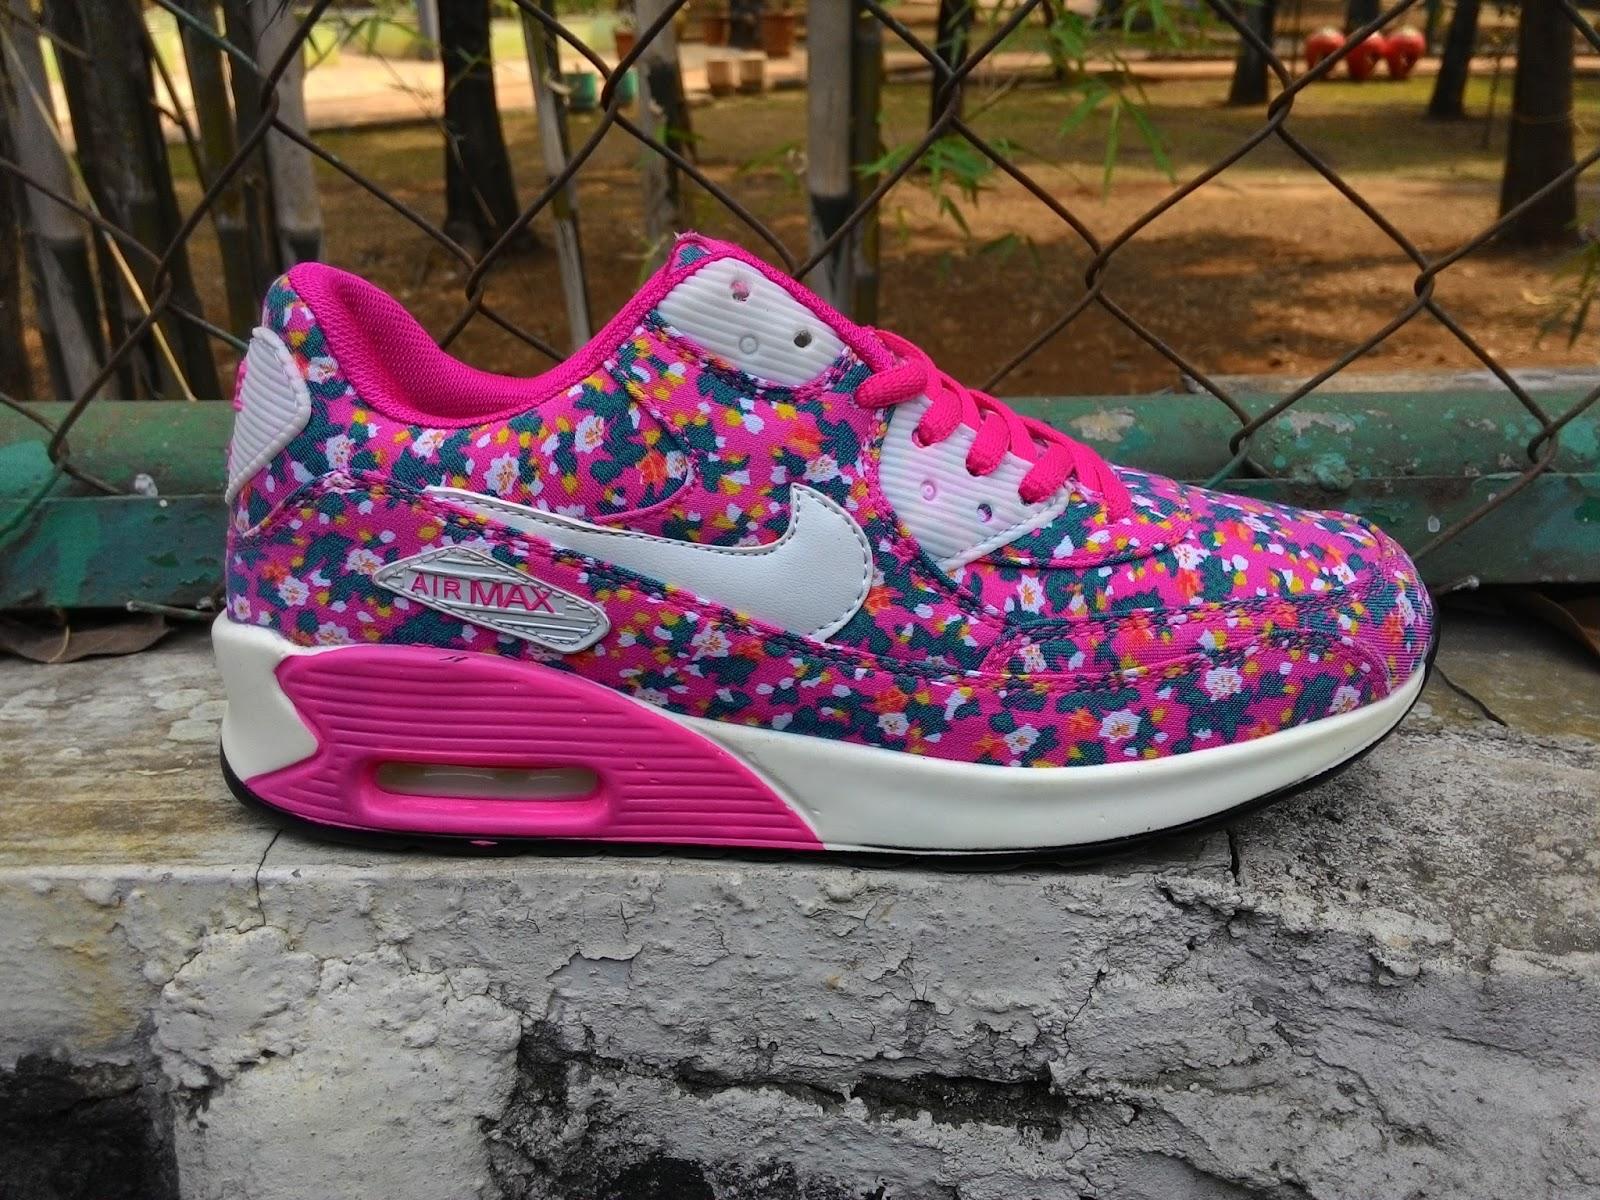 Sepatu Nike Airmax Flower Women Toko Sepatu Sepatu Murah